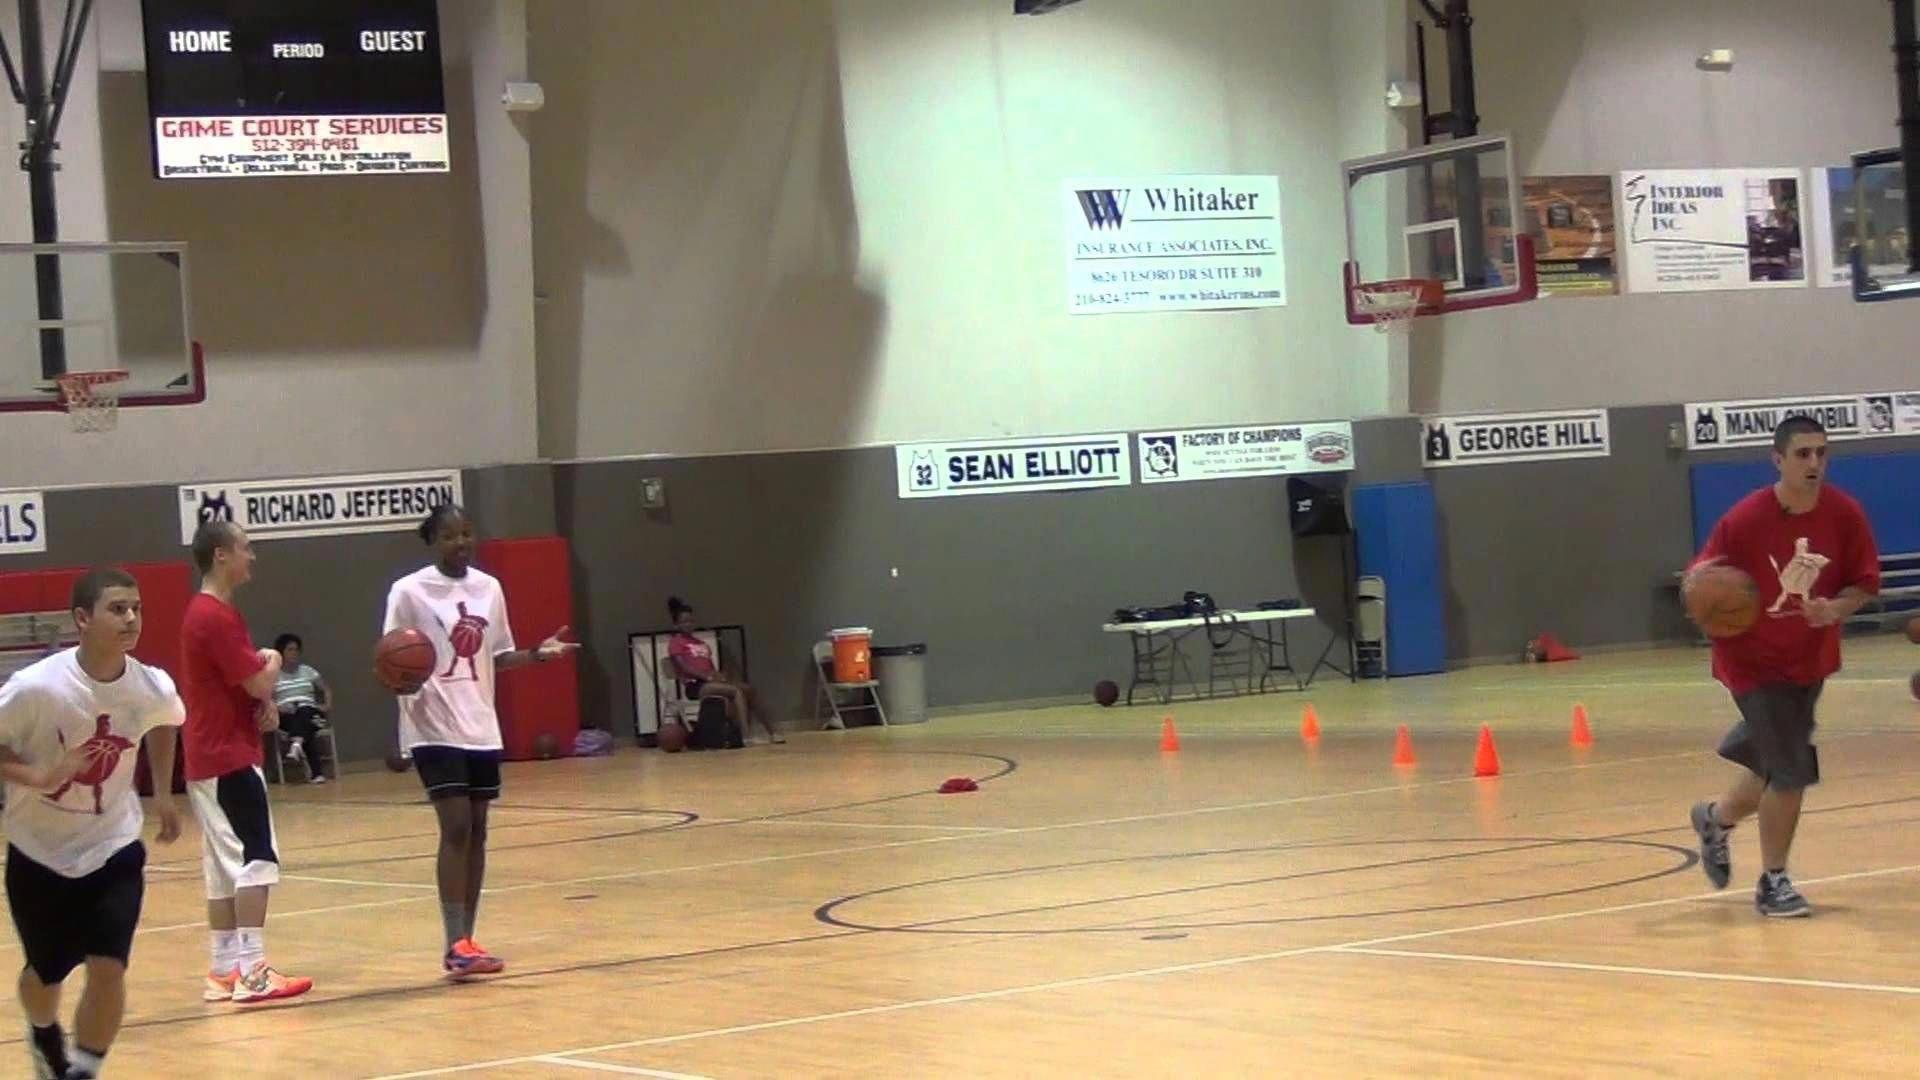 Danny Green Transition Shooting Drill San Antonio Basketball Camp Basketballcamps Louisvilleb Basketball Camp Louisville Basketball Indoor Basketball Court